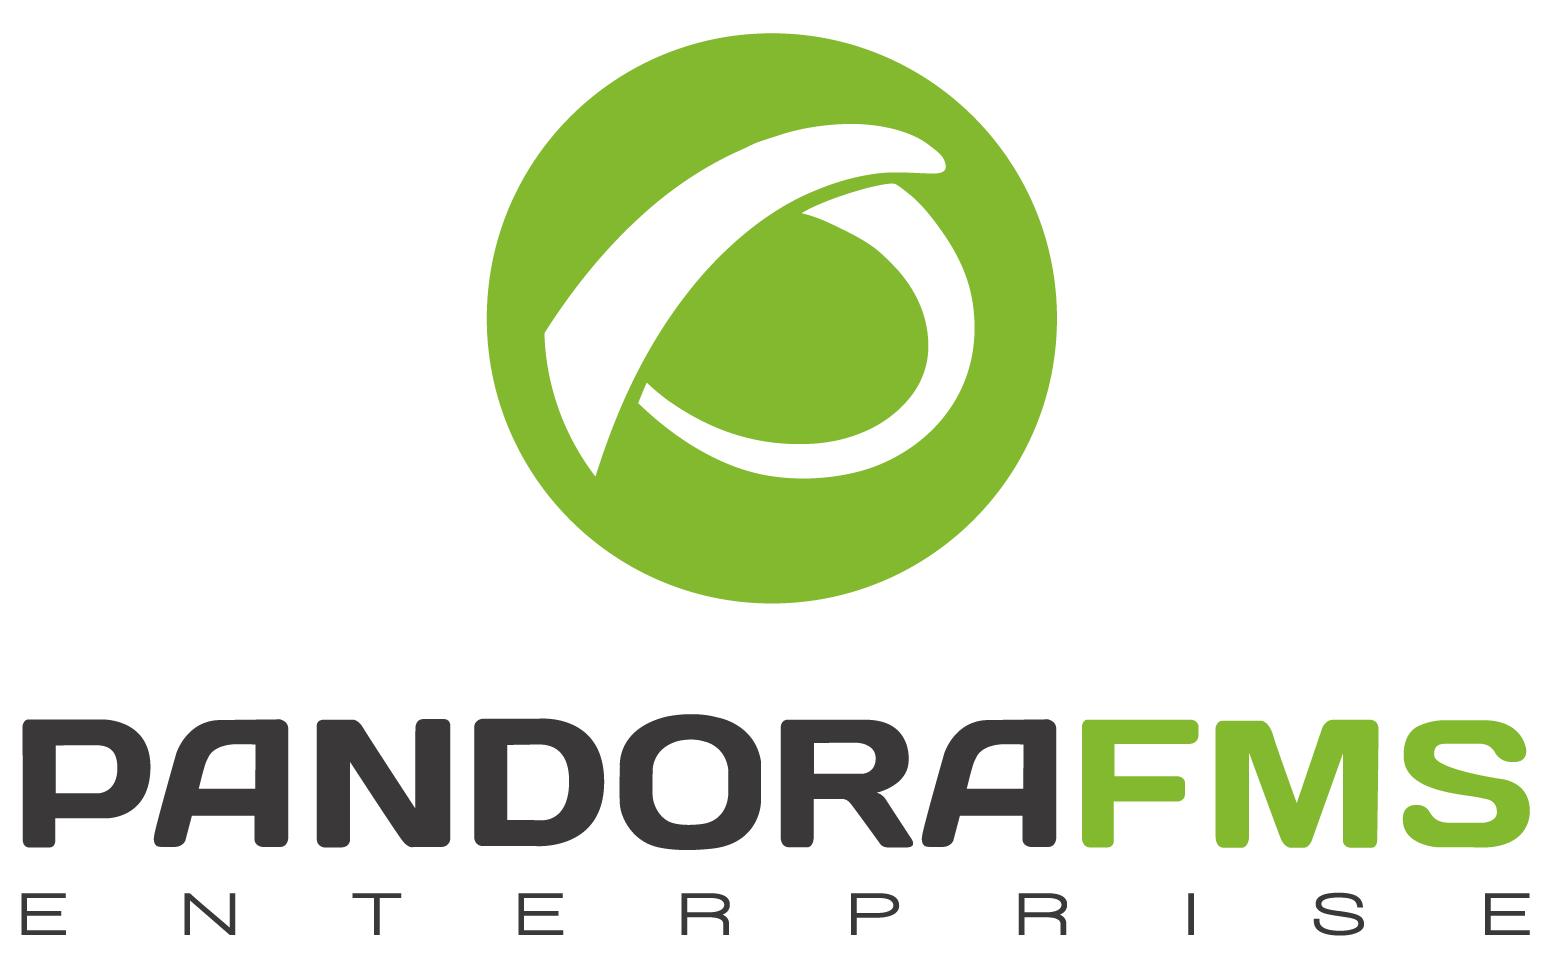 Network Monitoring Tool - Pandora FMS | Network solutions, Network monitor,  Enterprise application